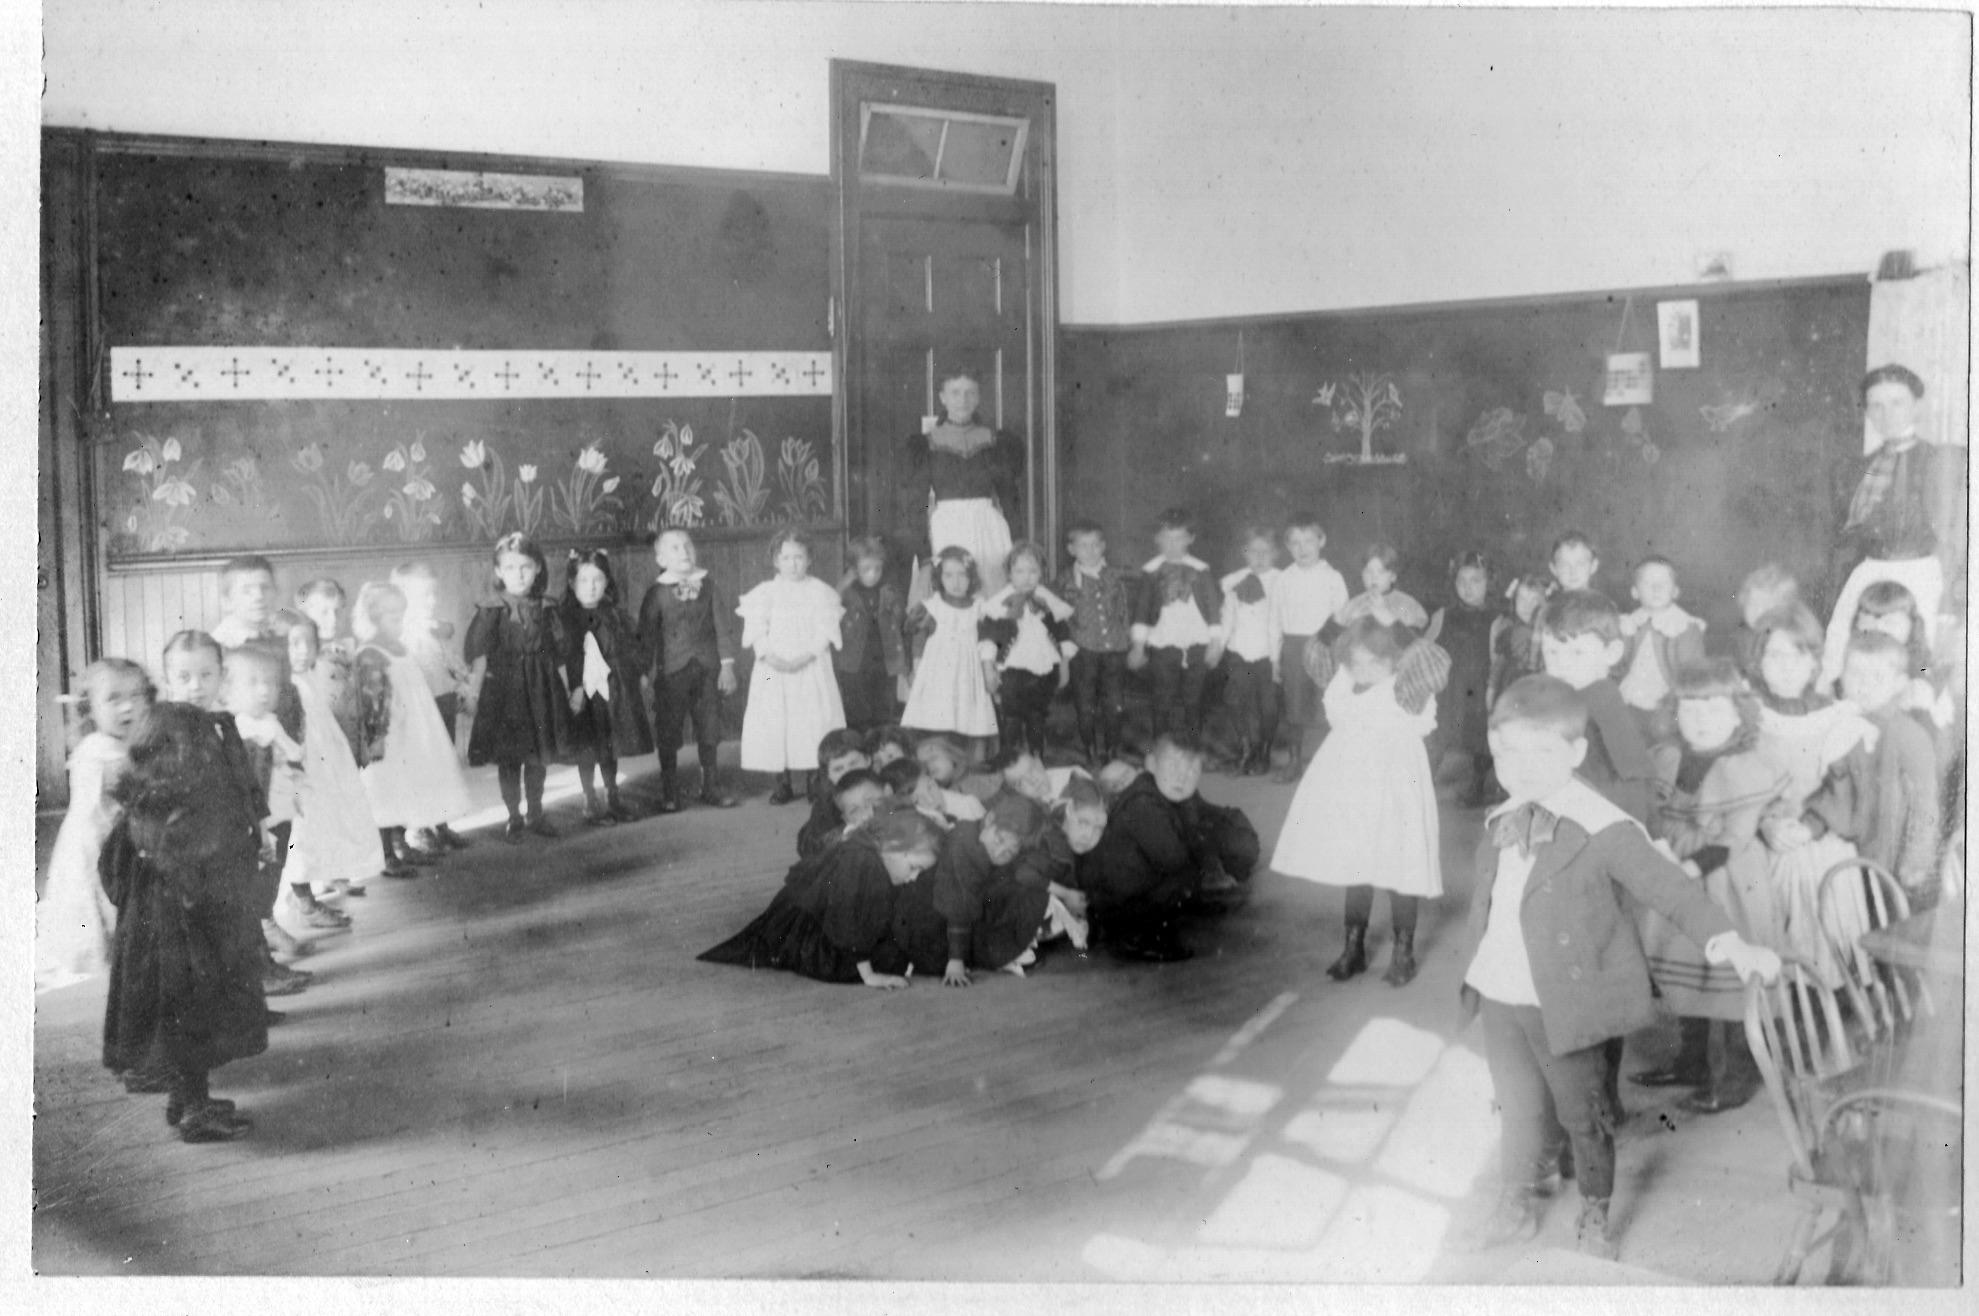 schools as imagined communities dorn sherman shircliffe barbara j cobb roberts deirdre